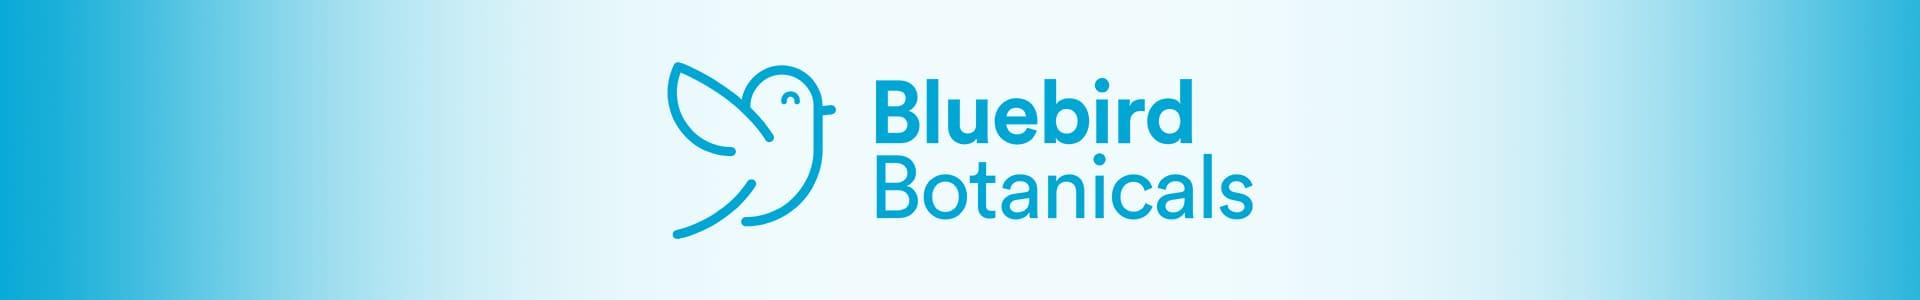 Buy Bluebird Botanicals Online